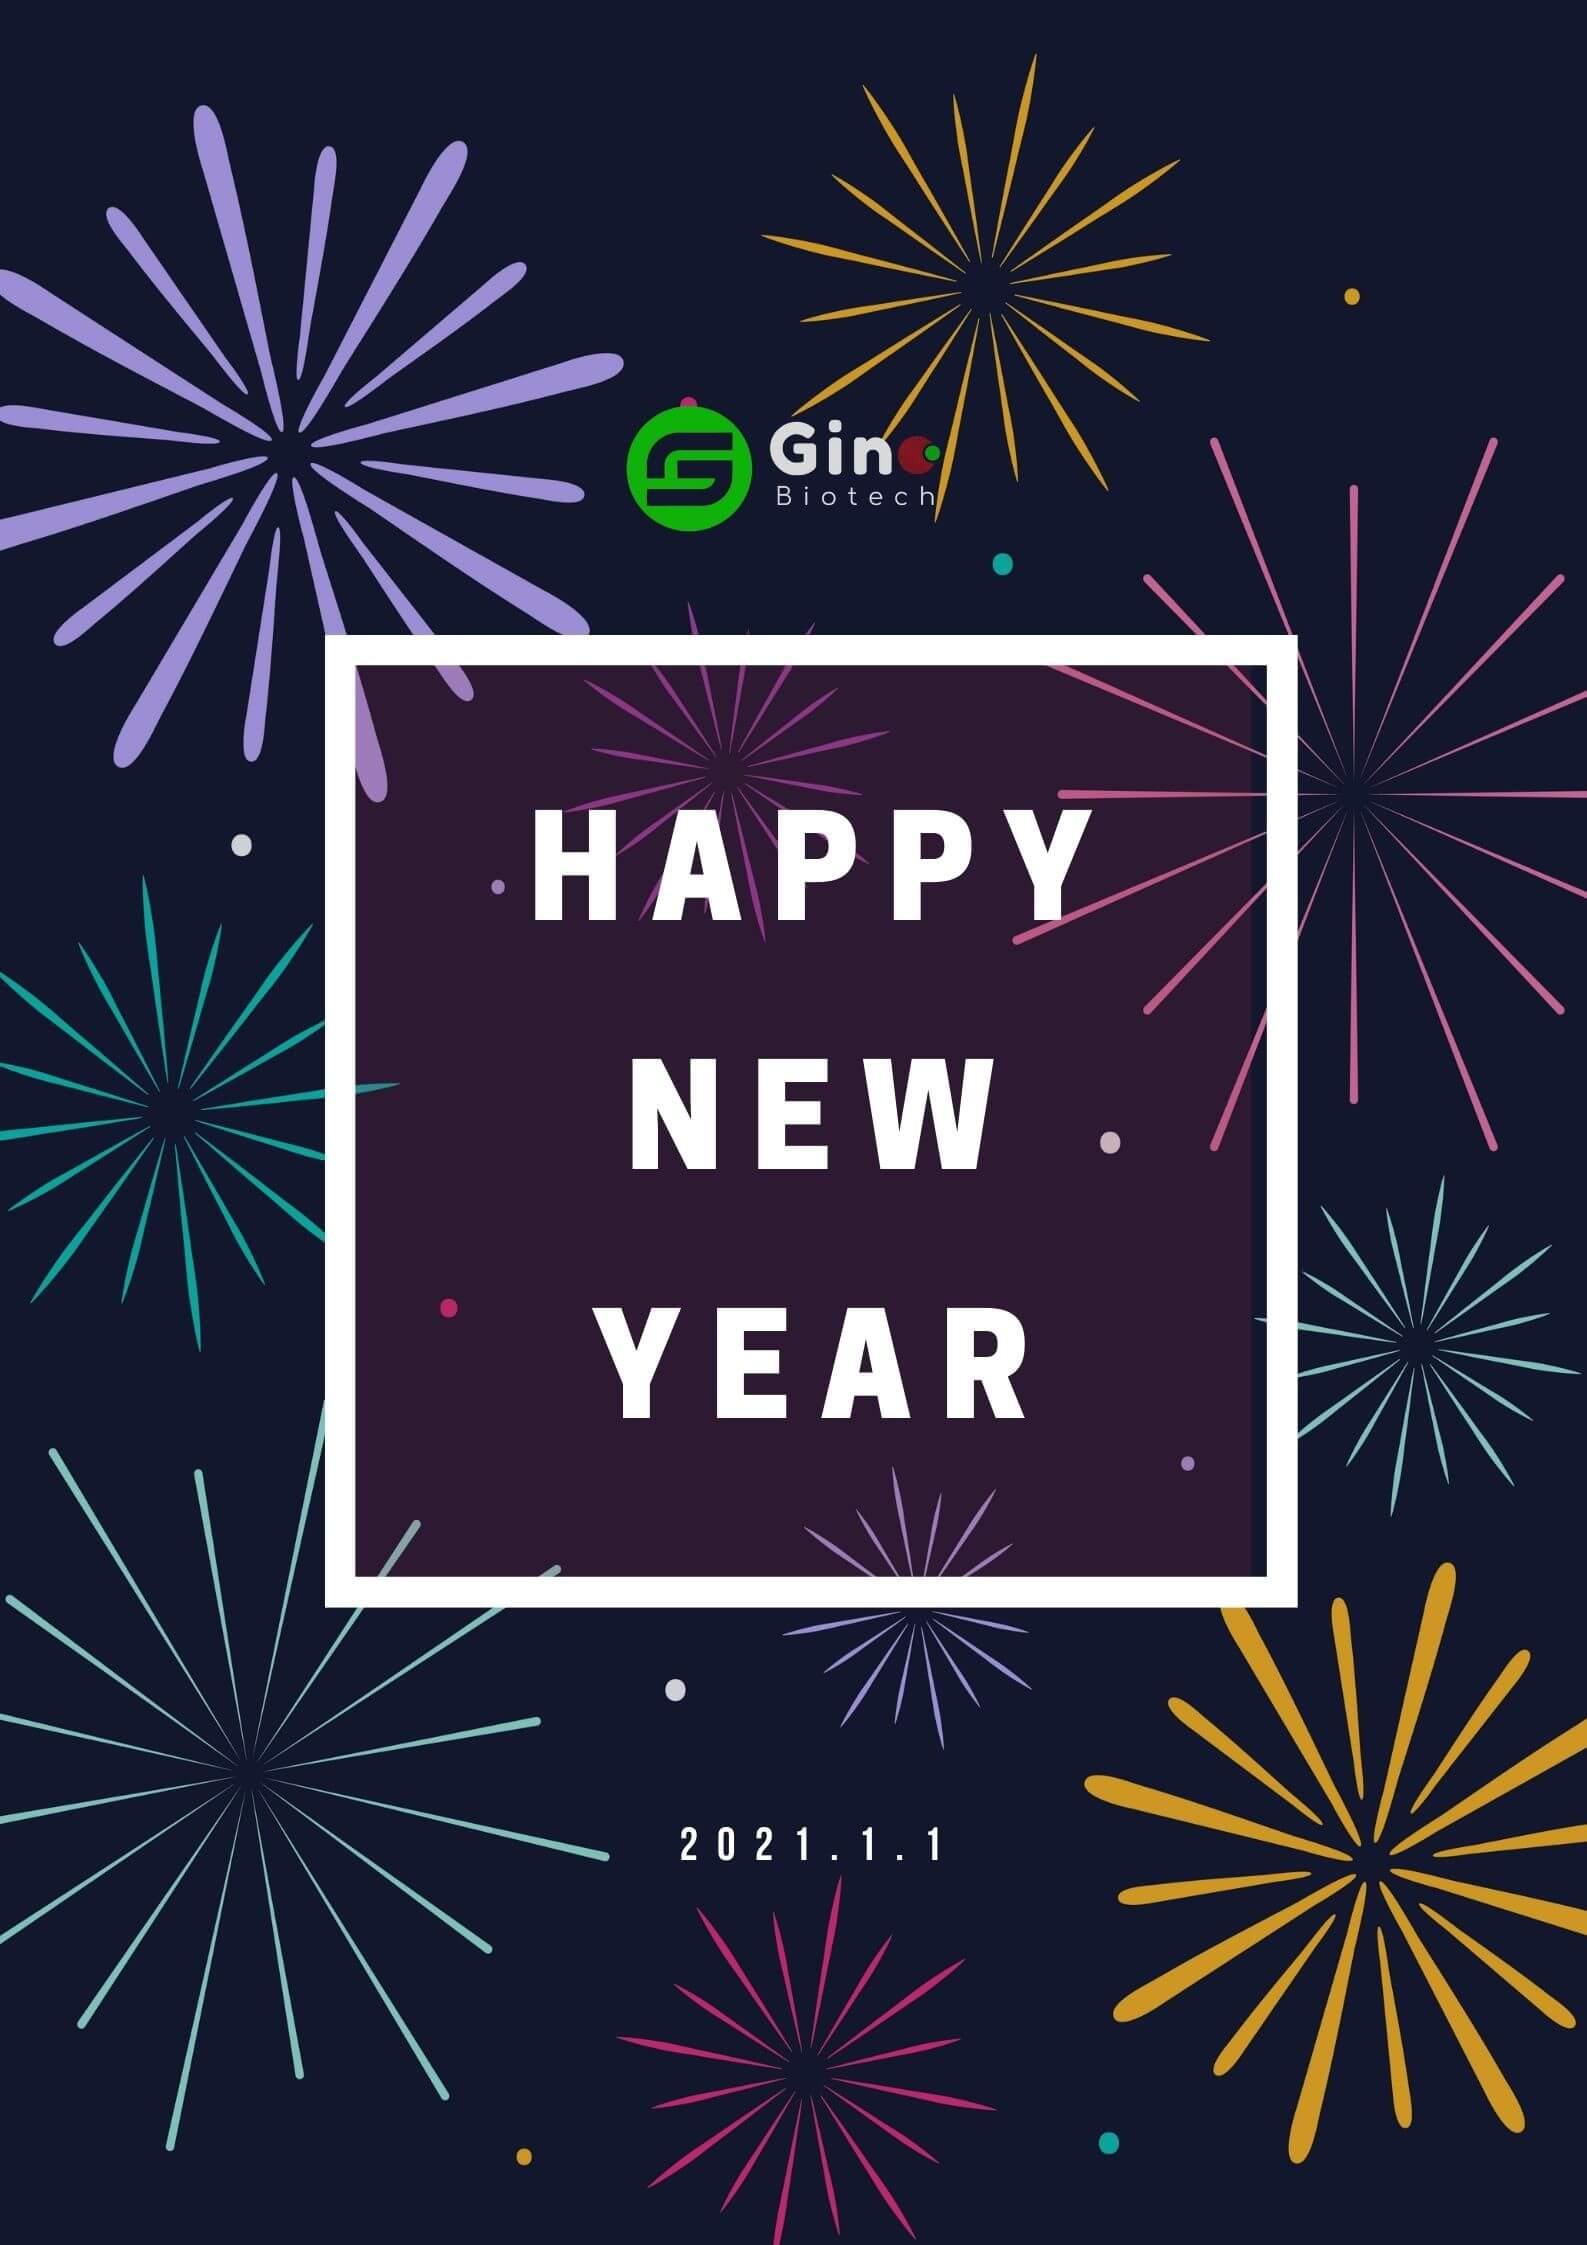 Happy new year 2021 41